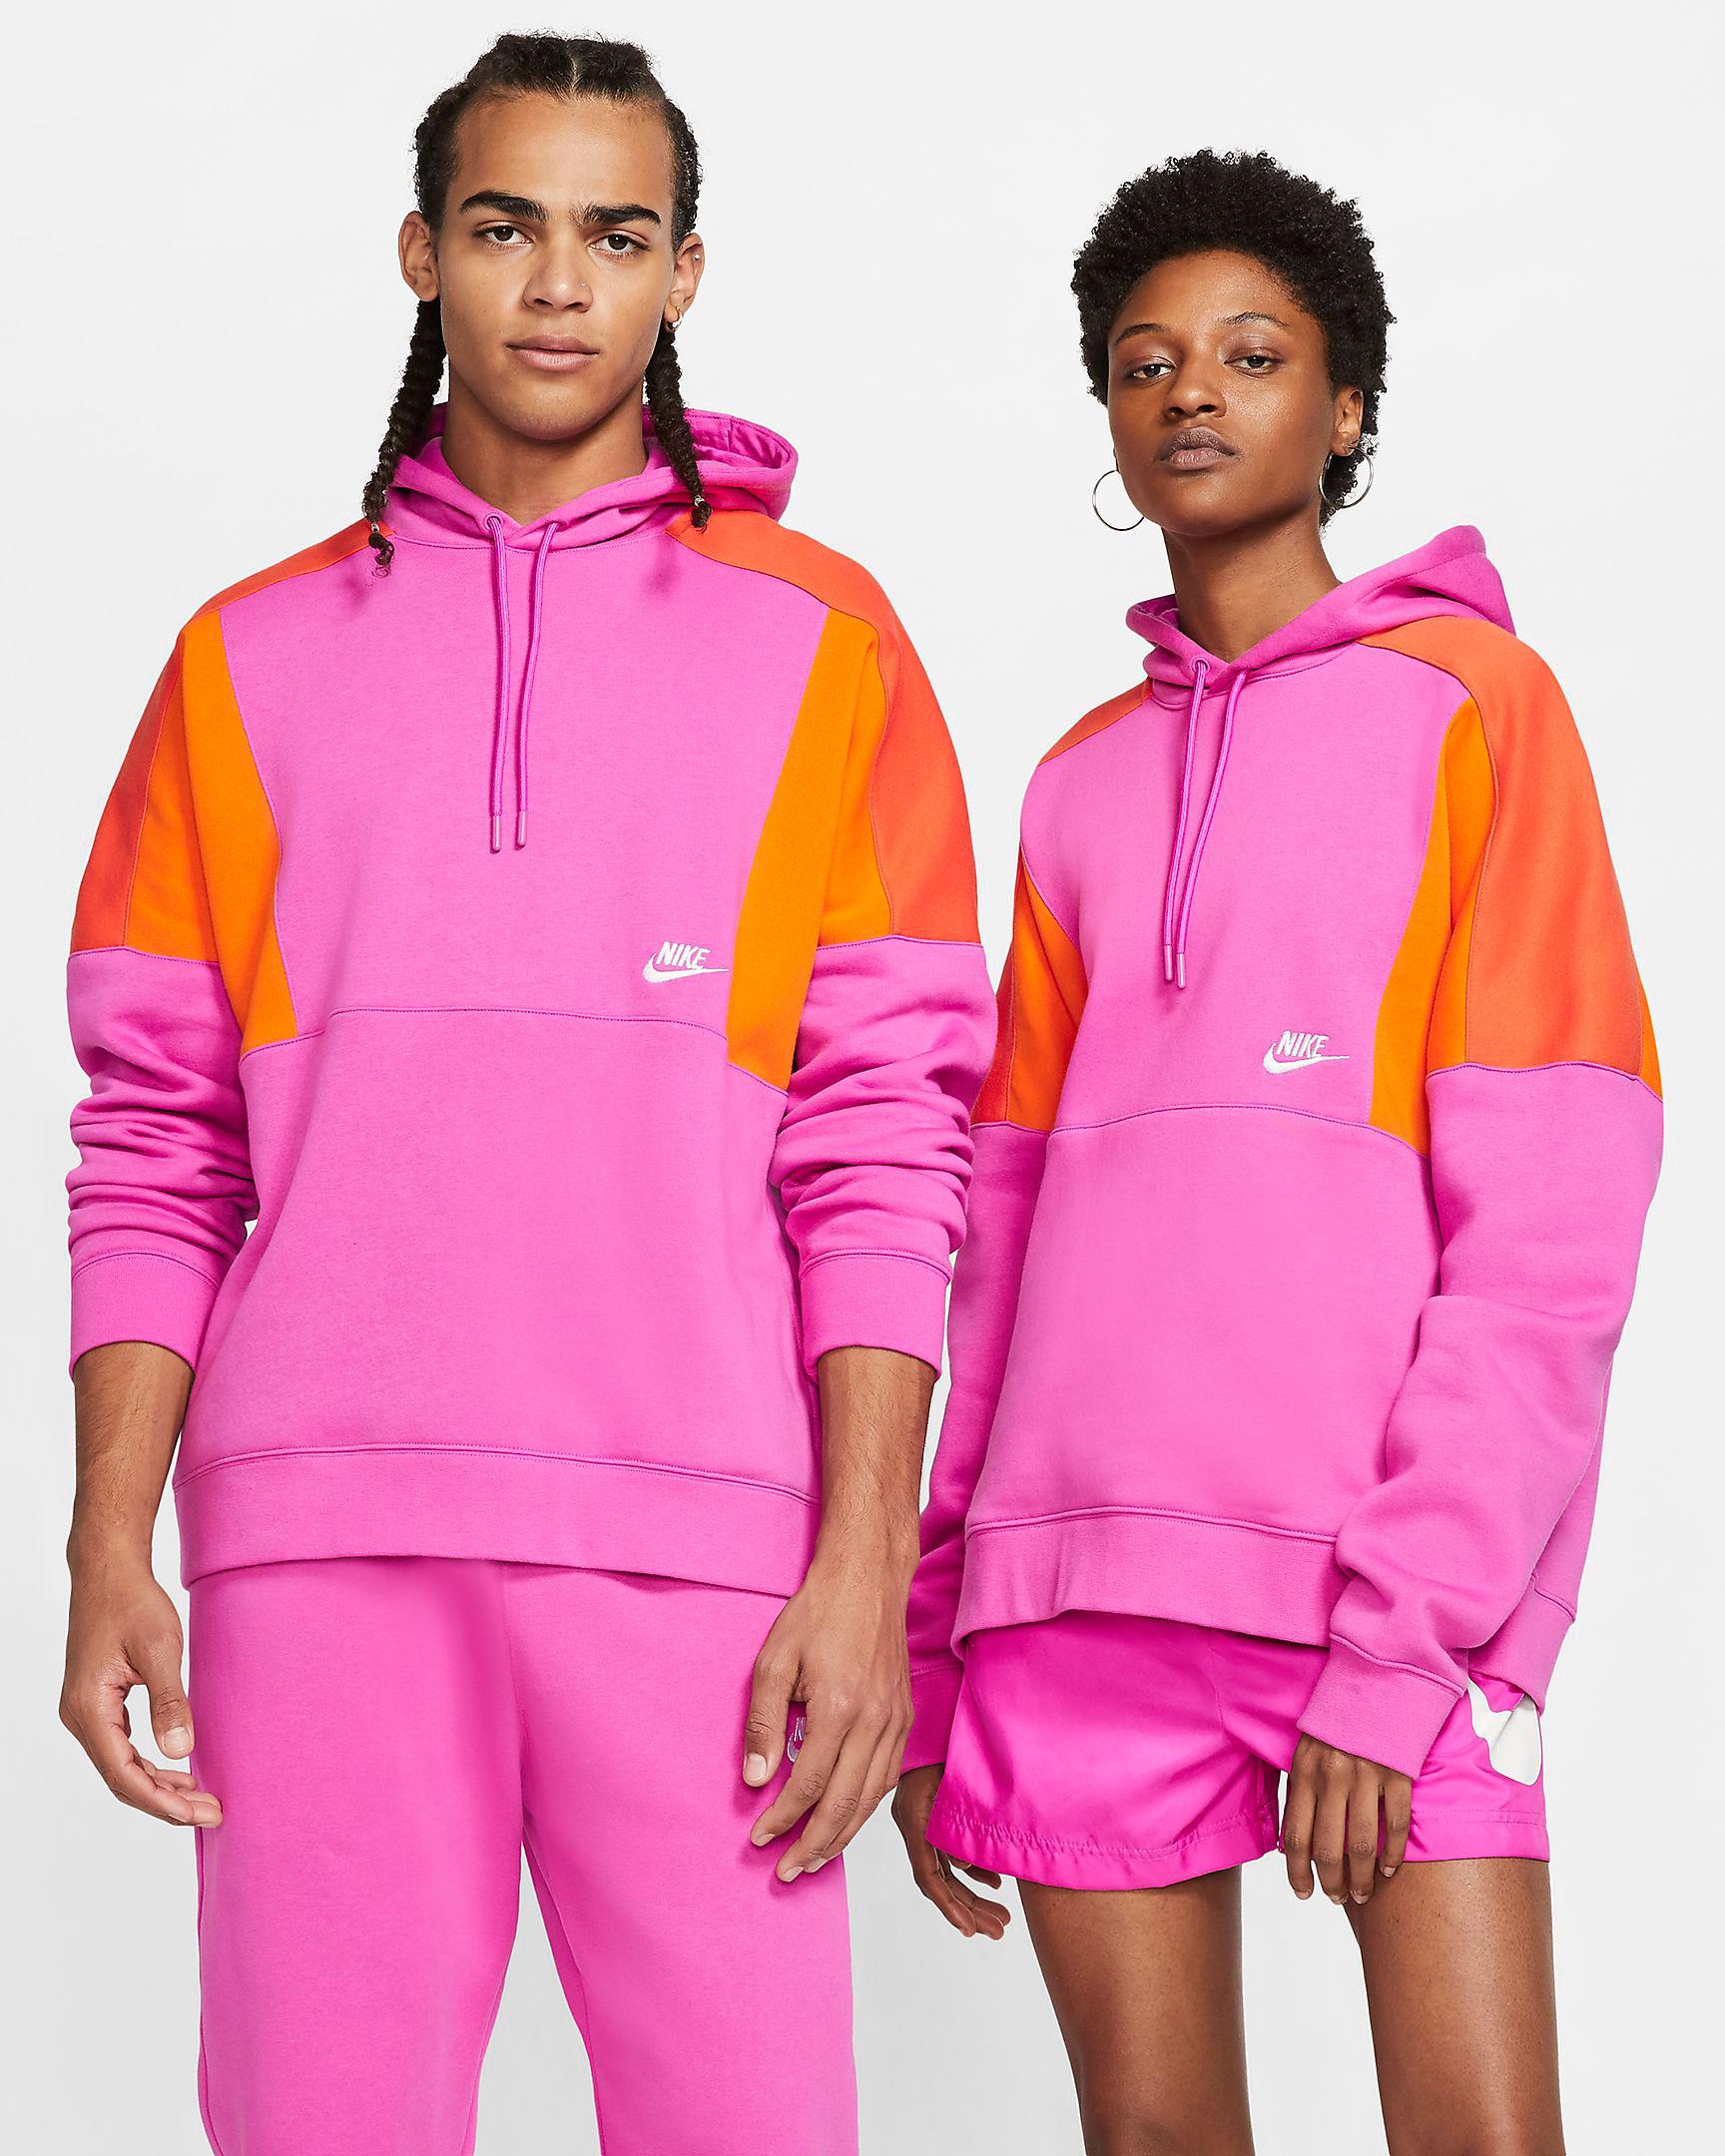 nike-sportswear-orange-pink-fuschia-hoodie